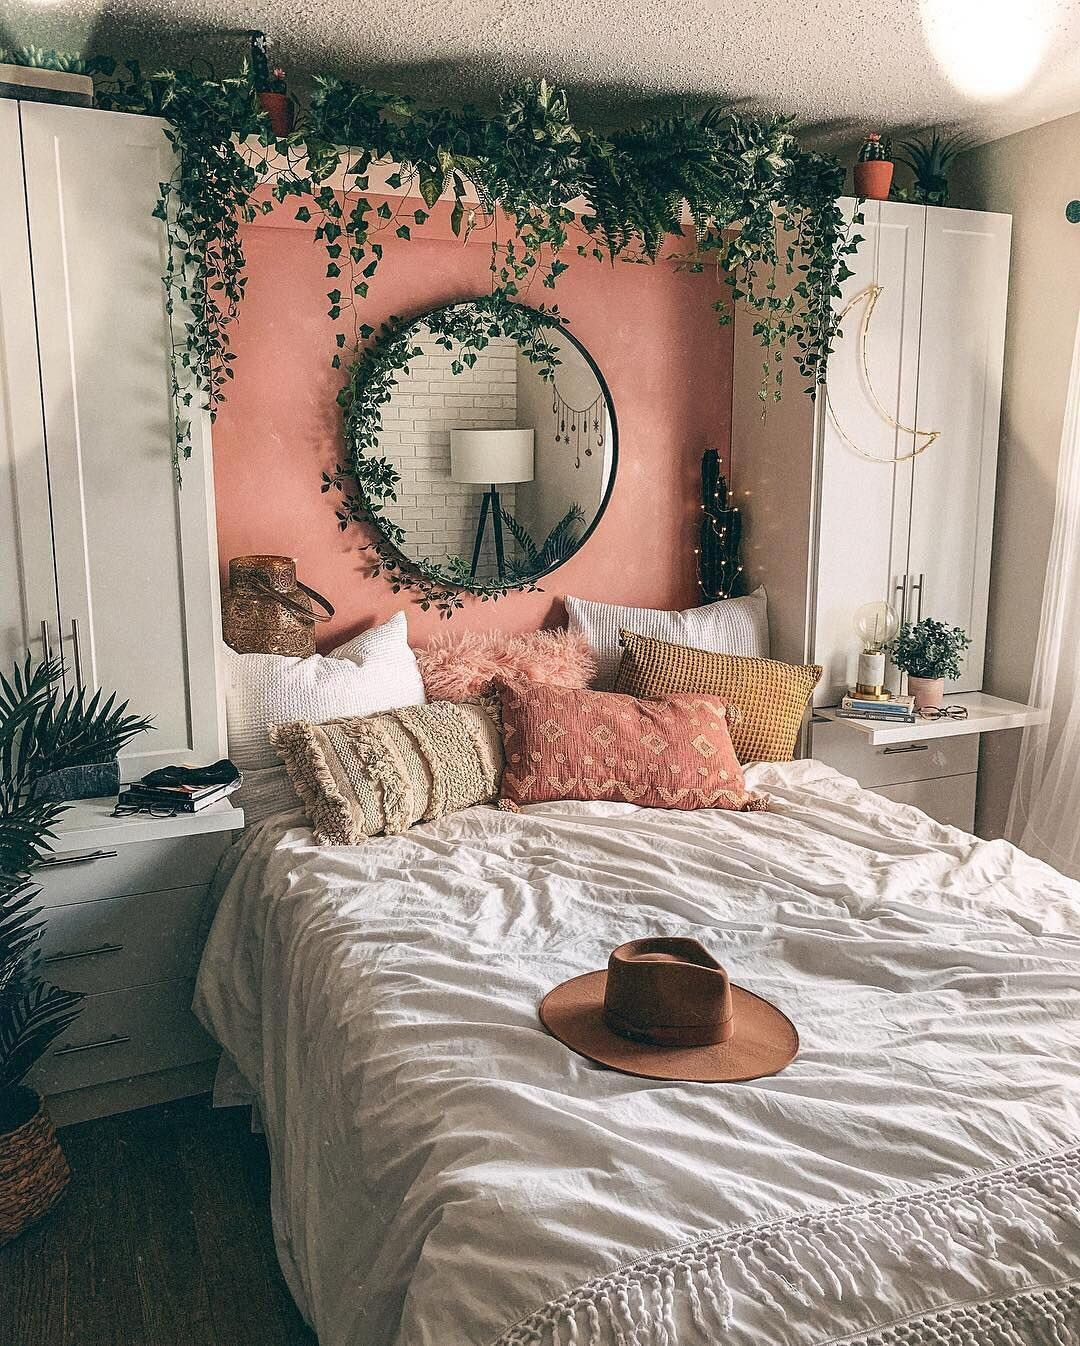 Pinterest Awipmegan Betten In 2019 Schlafzimmer Ideen